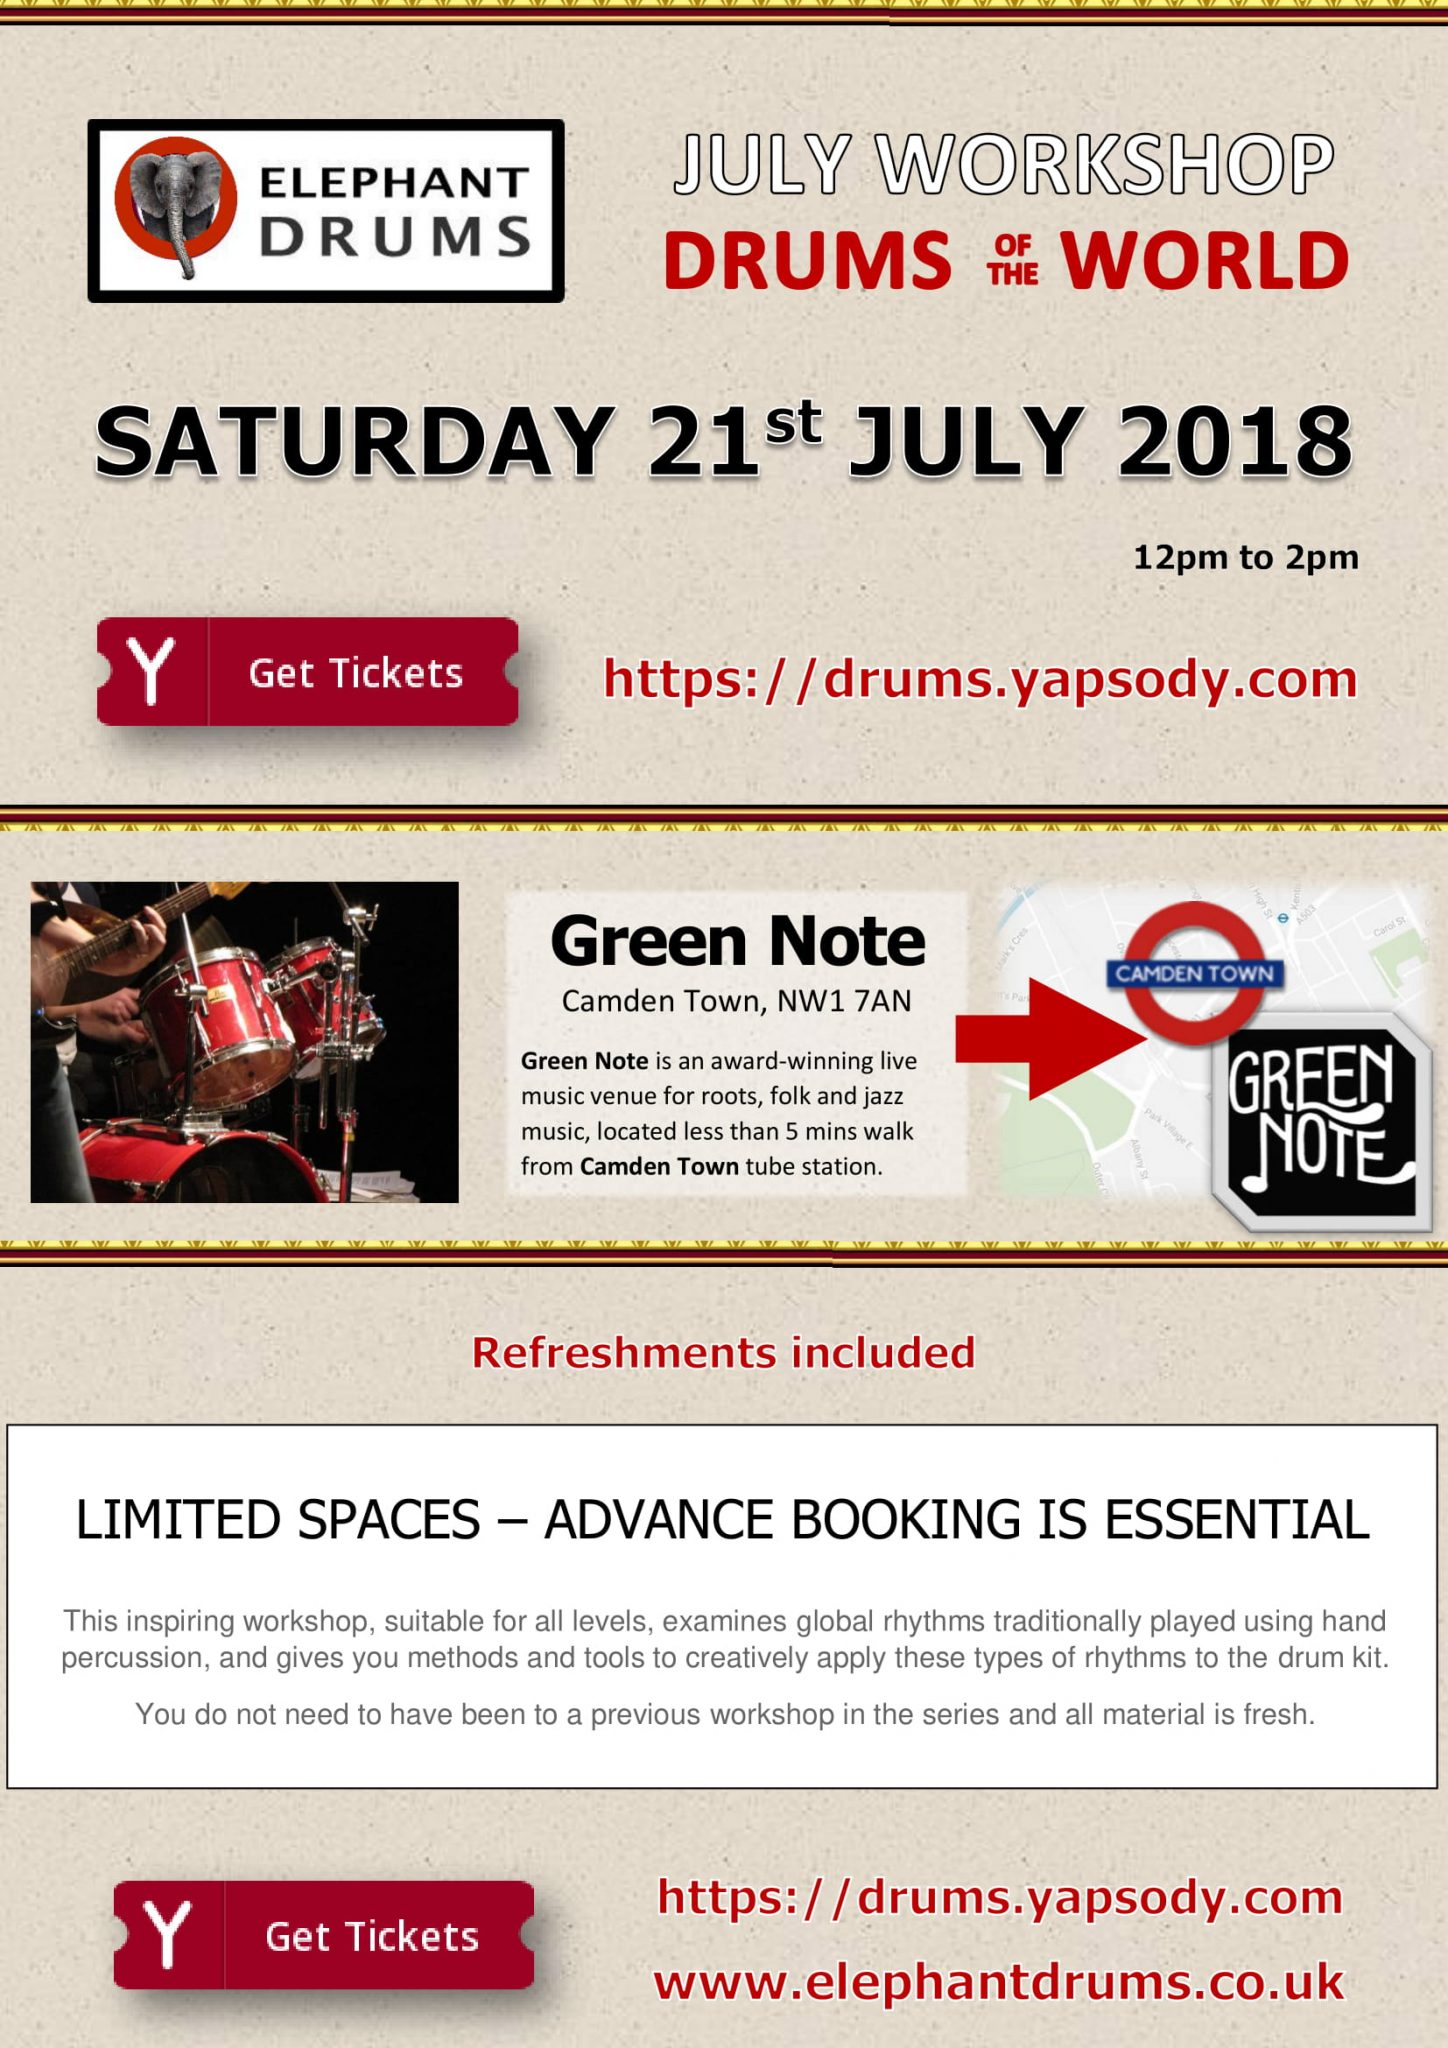 Drums of the World - Workshop - July 2018